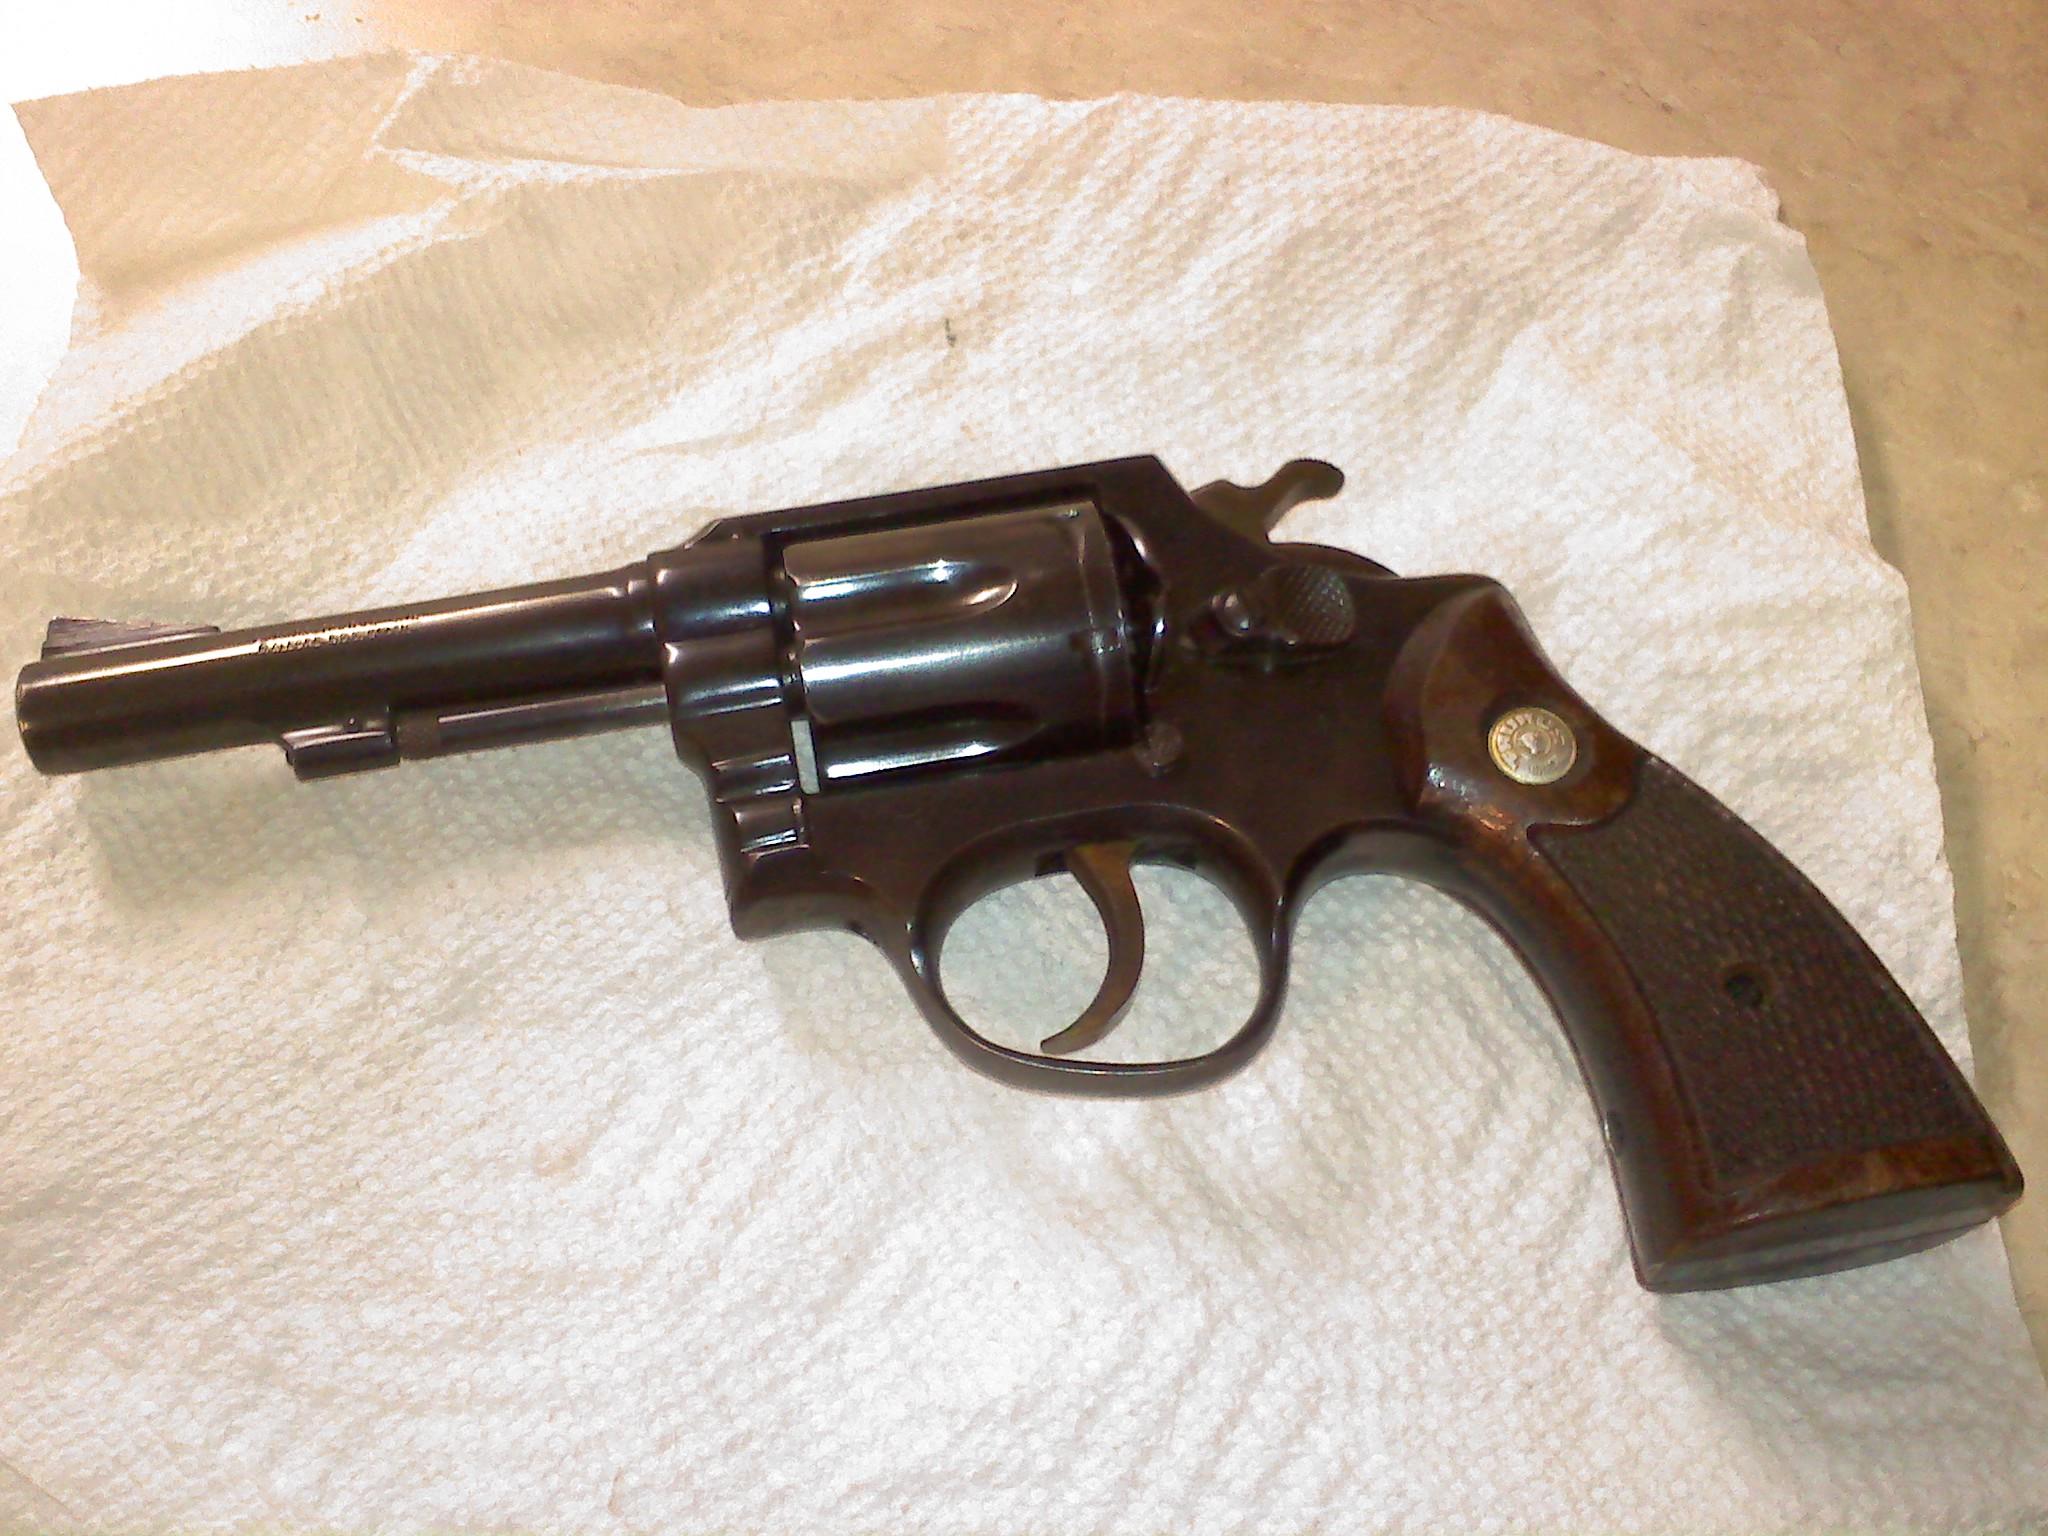 Identifying An Old Revolver